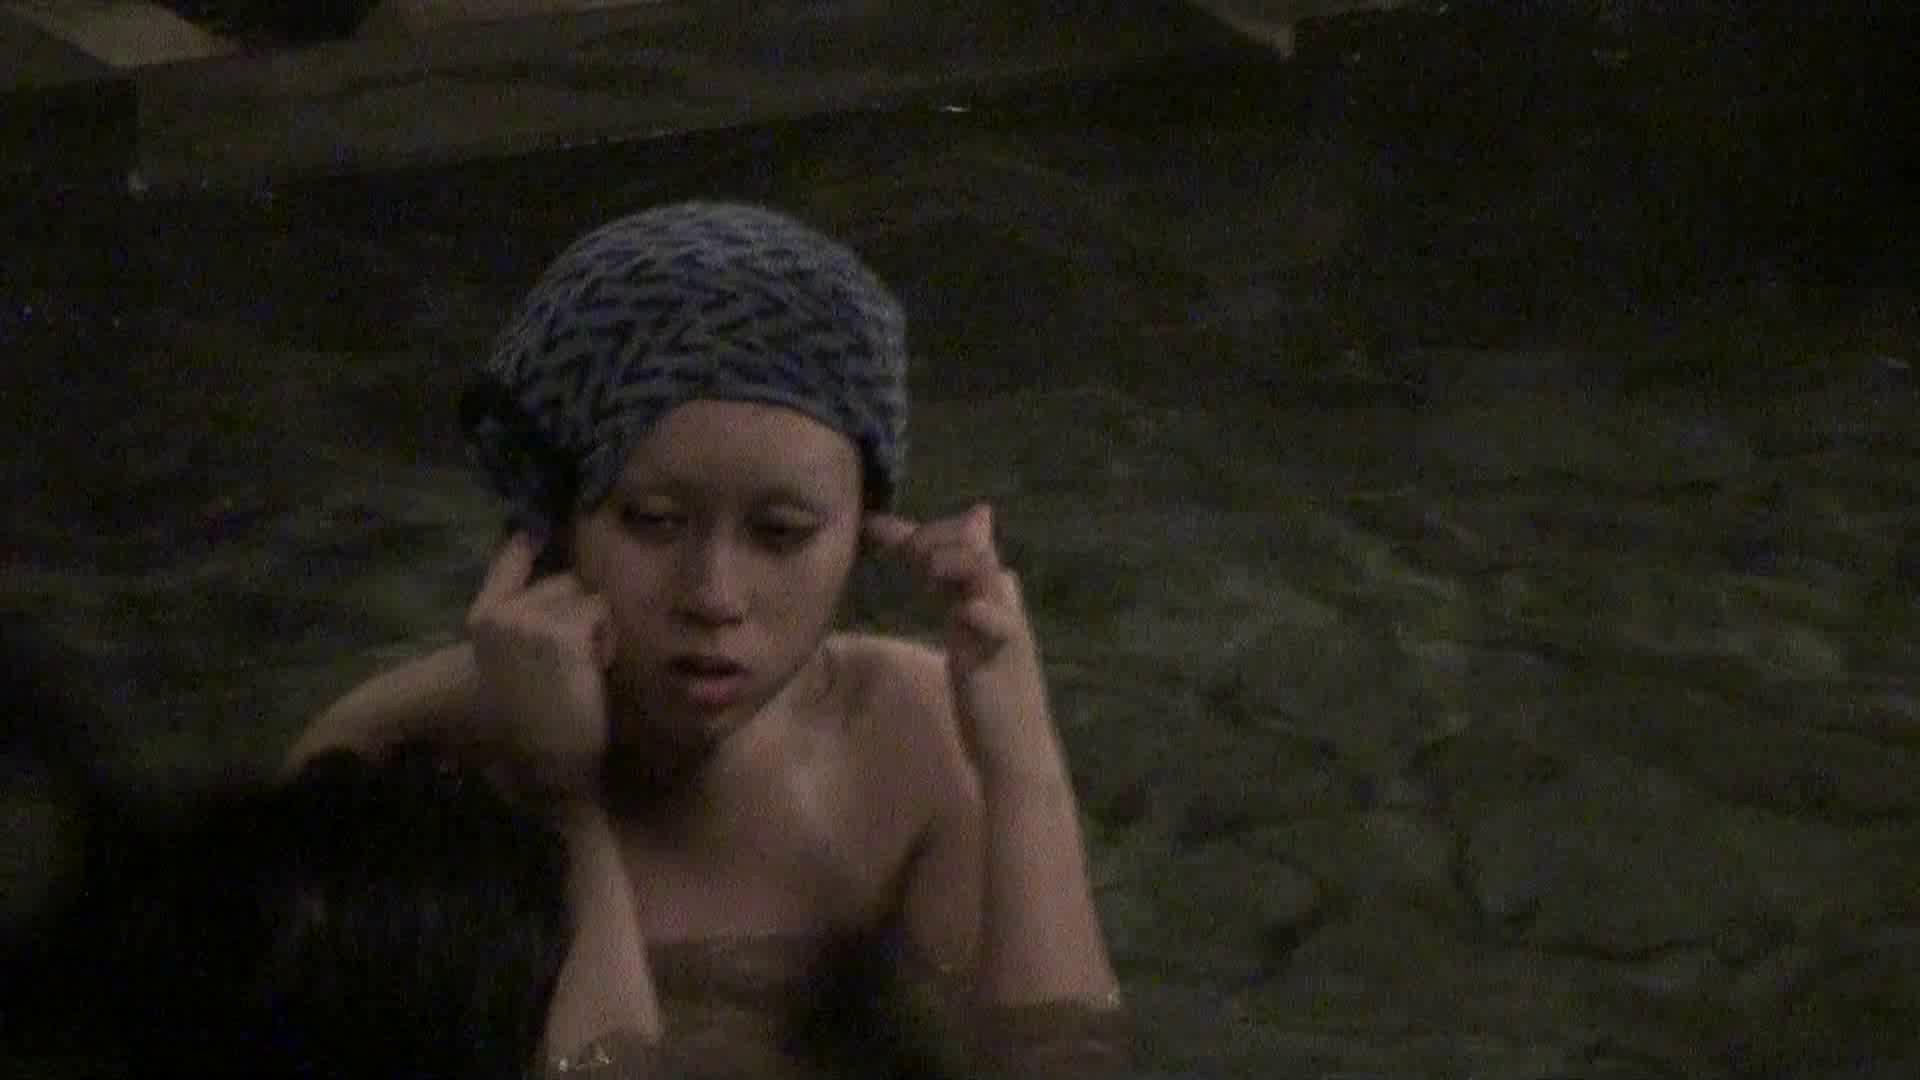 Aquaな露天風呂Vol.367 盗撮 | HなOL  96pic 73